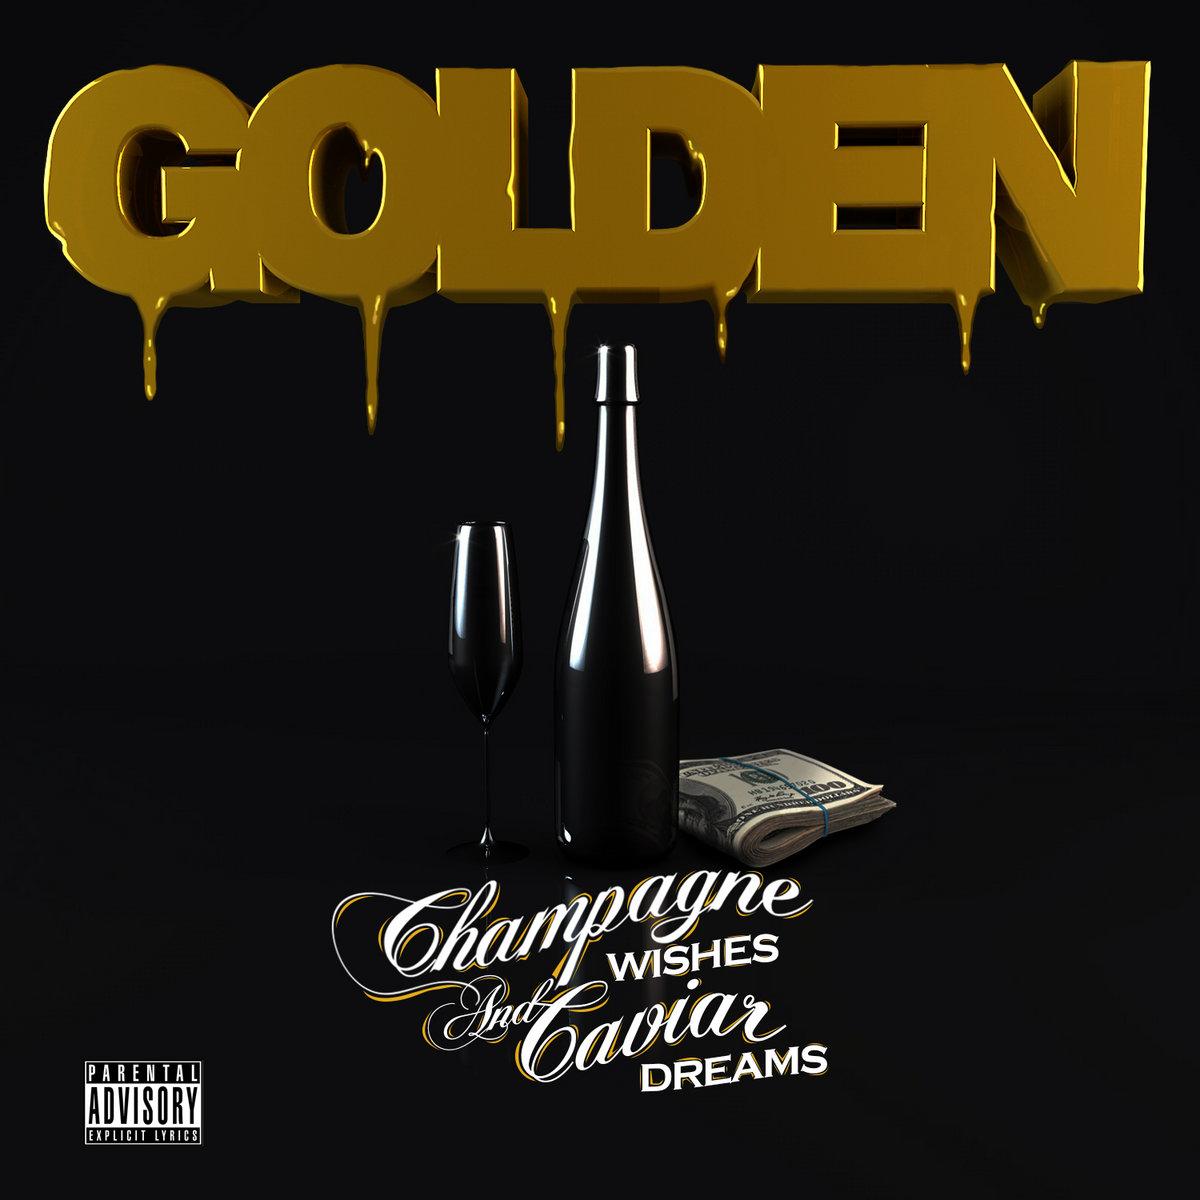 champagne wishes and caviar dreams juve cenitdelacabrera co